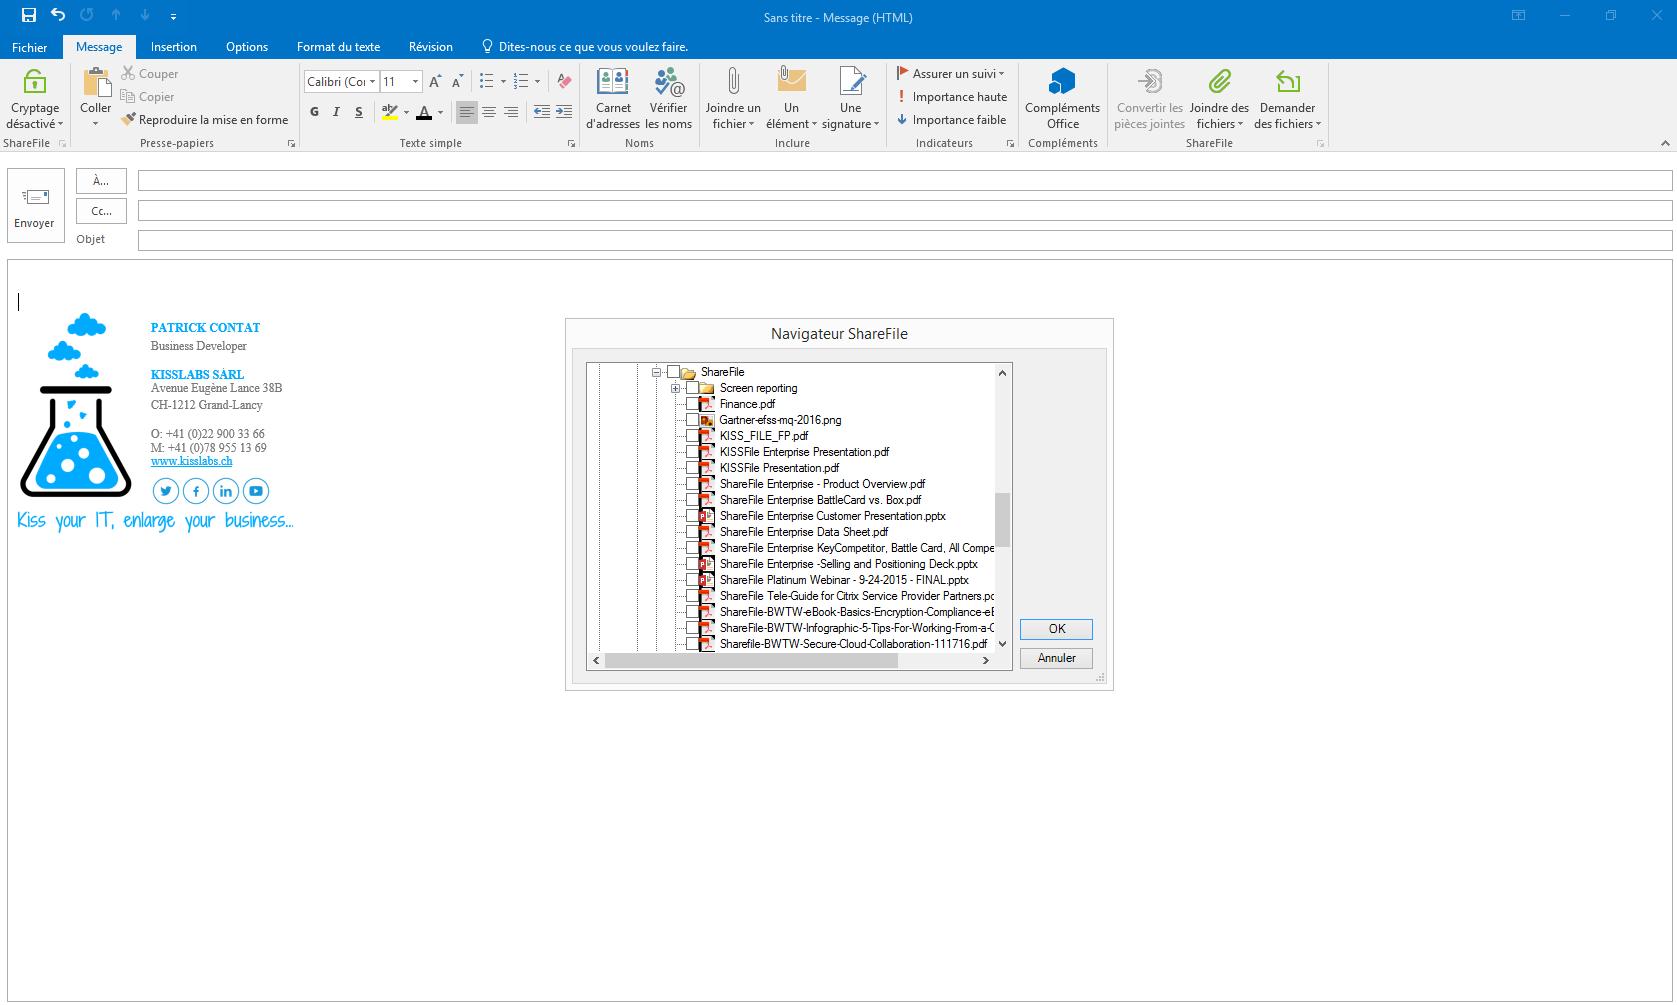 KissFile - Citrix ShareFile - Joindre fichier via Outlook emplacement